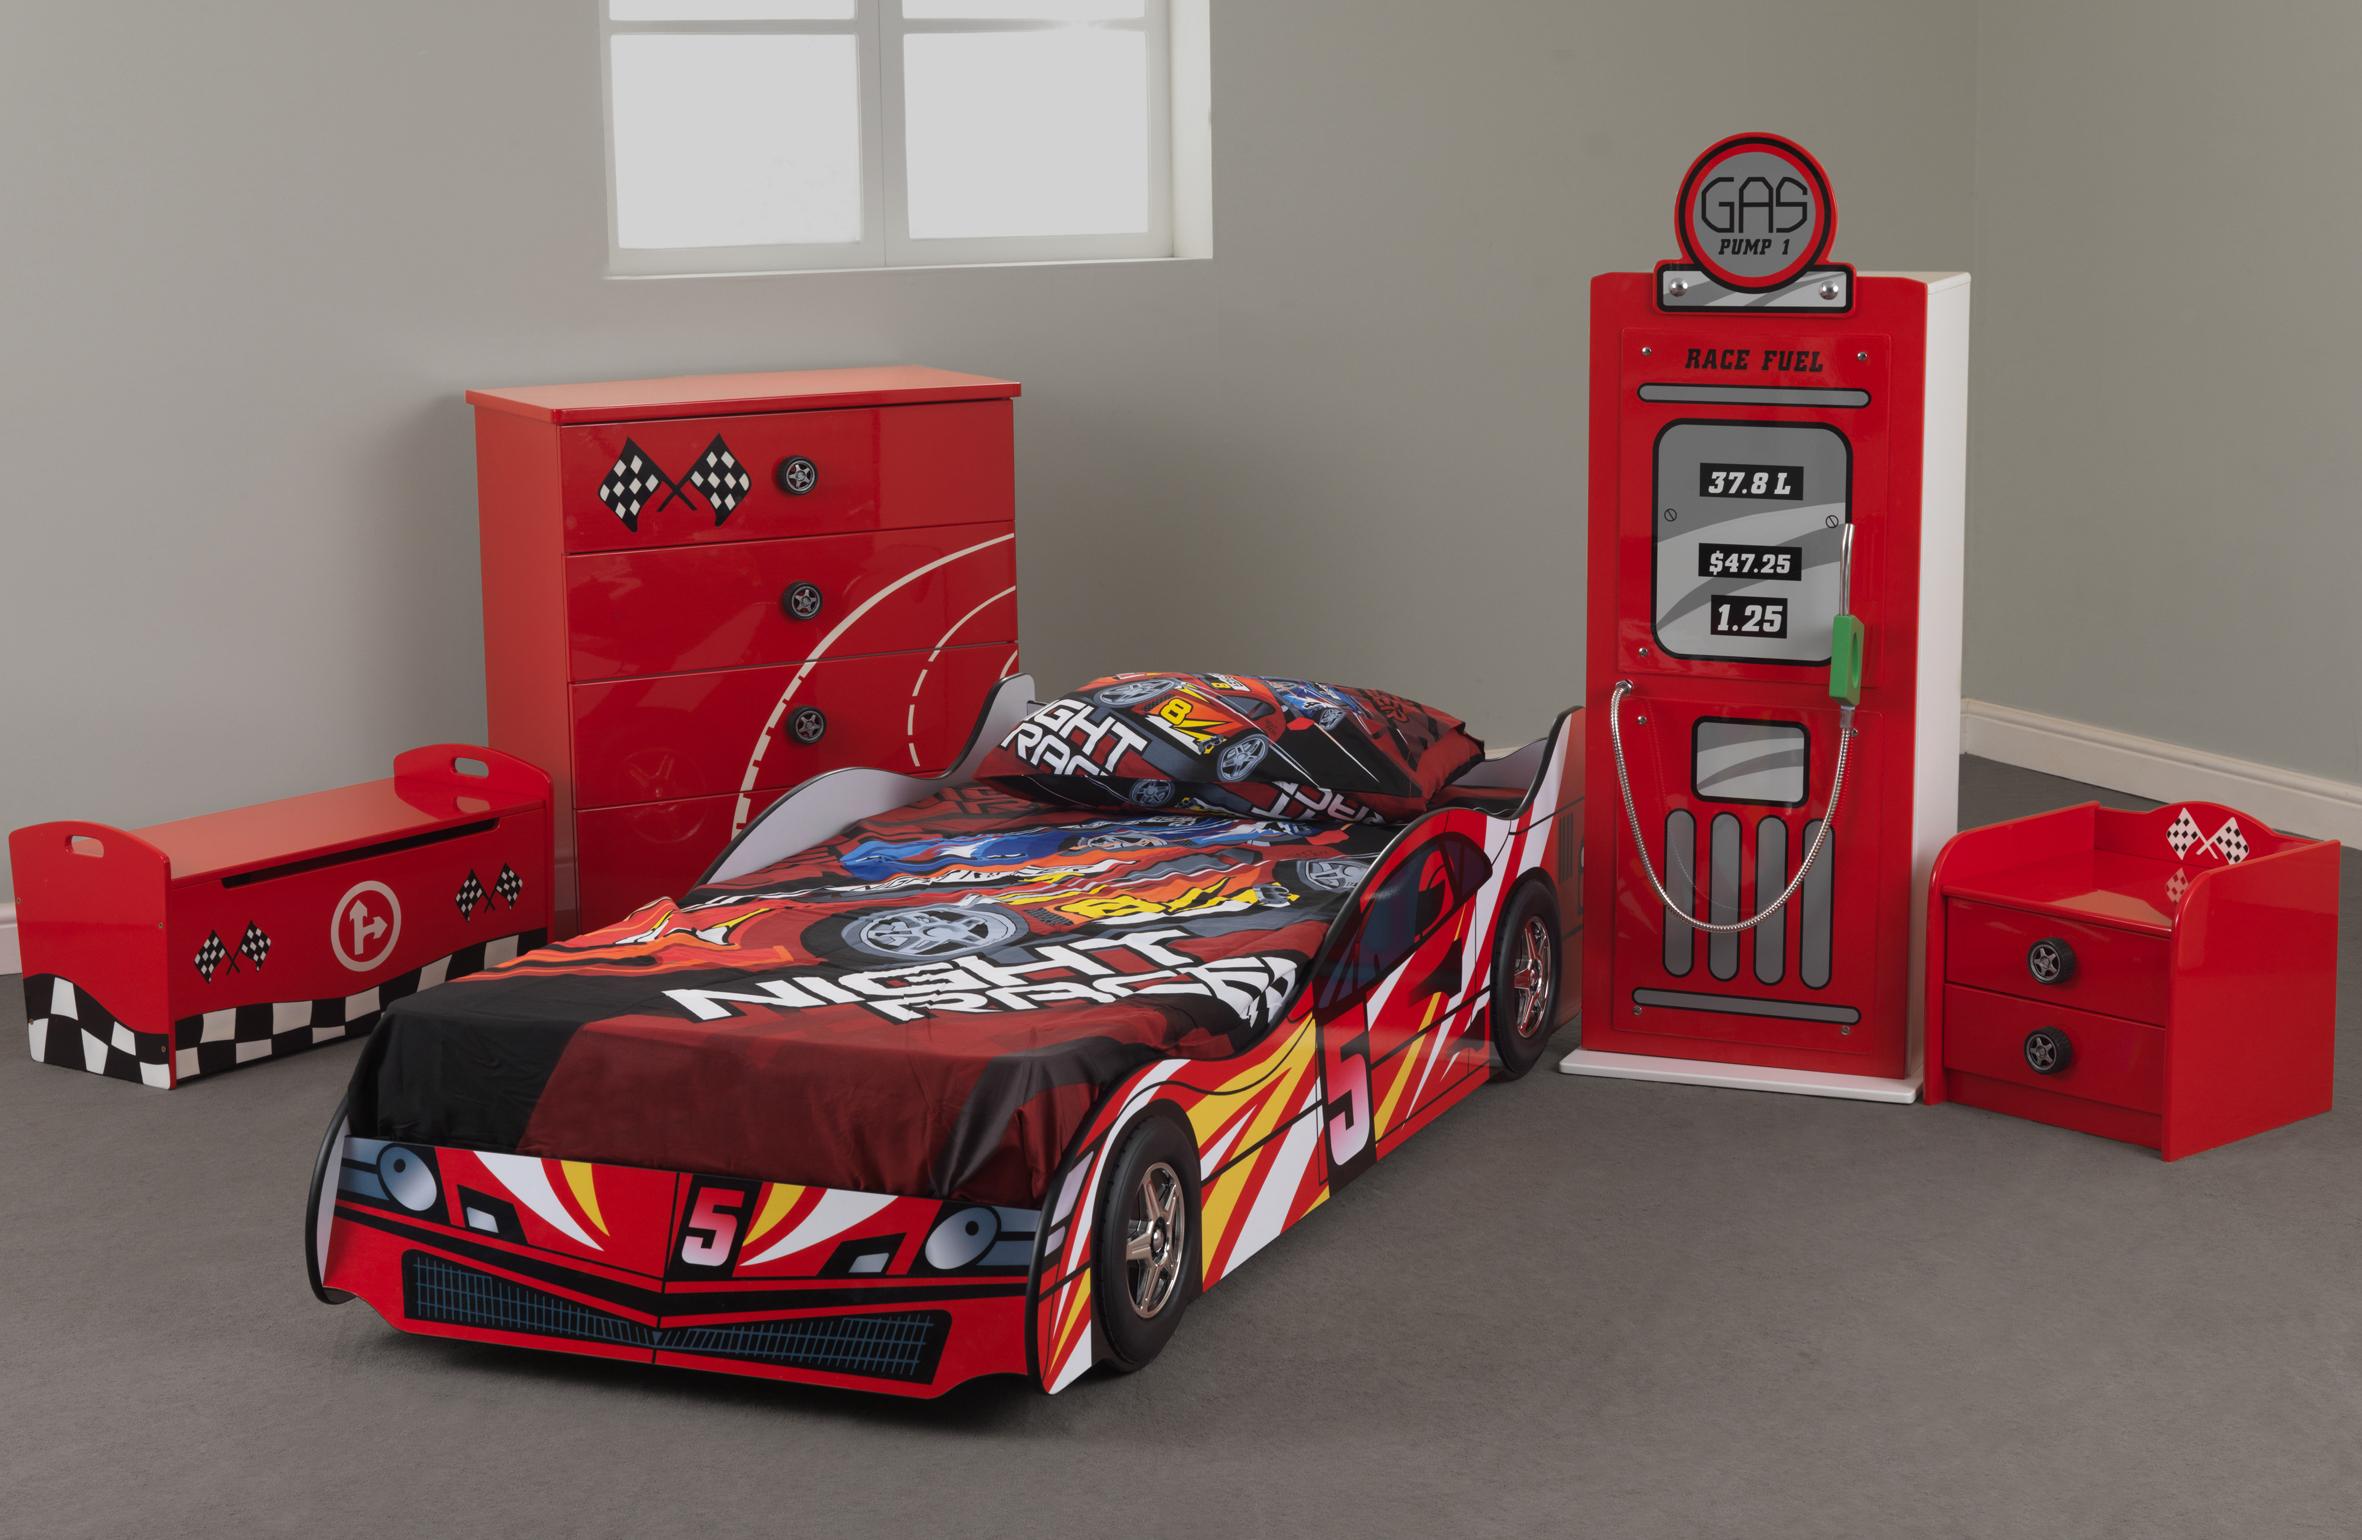 Sweet Dreams Formula One Childrens Race Car Bedroom Furniture Range Red Blue